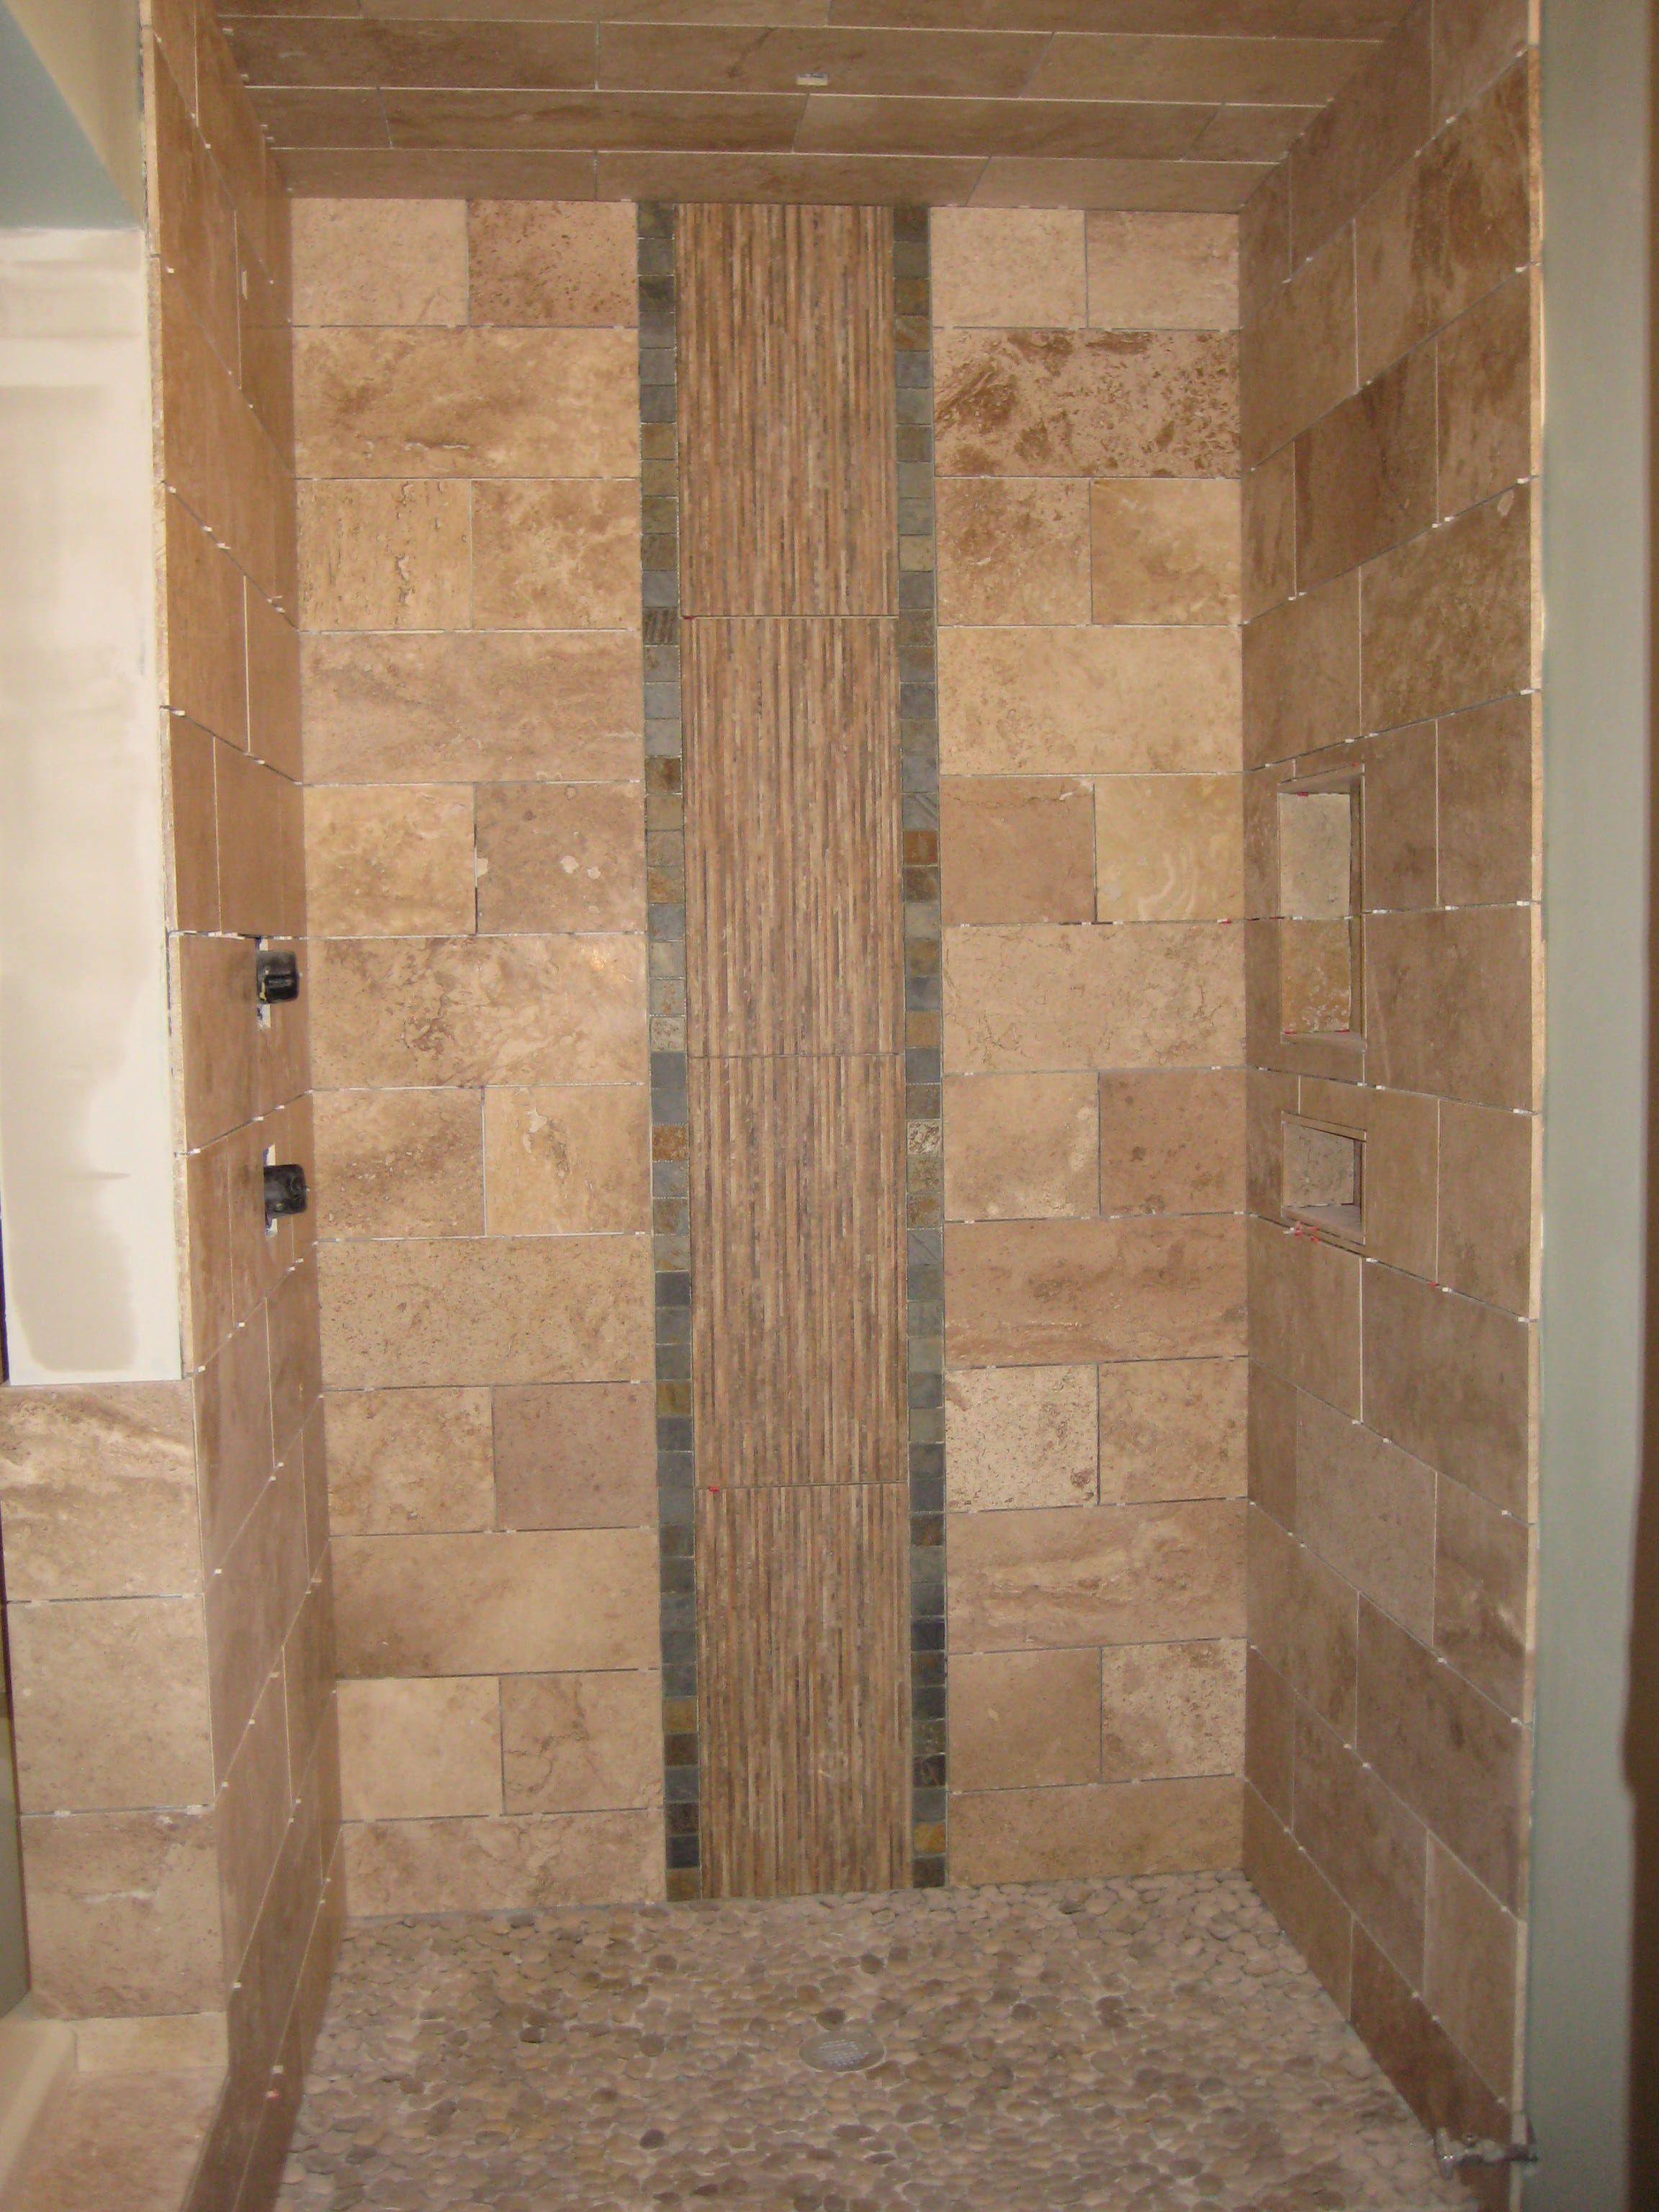 images about tile on pinterest shower tiles shower walls and marble showers. Marble Tile Bathroom  2  Queen Beige Marble Tile The Tile Shop